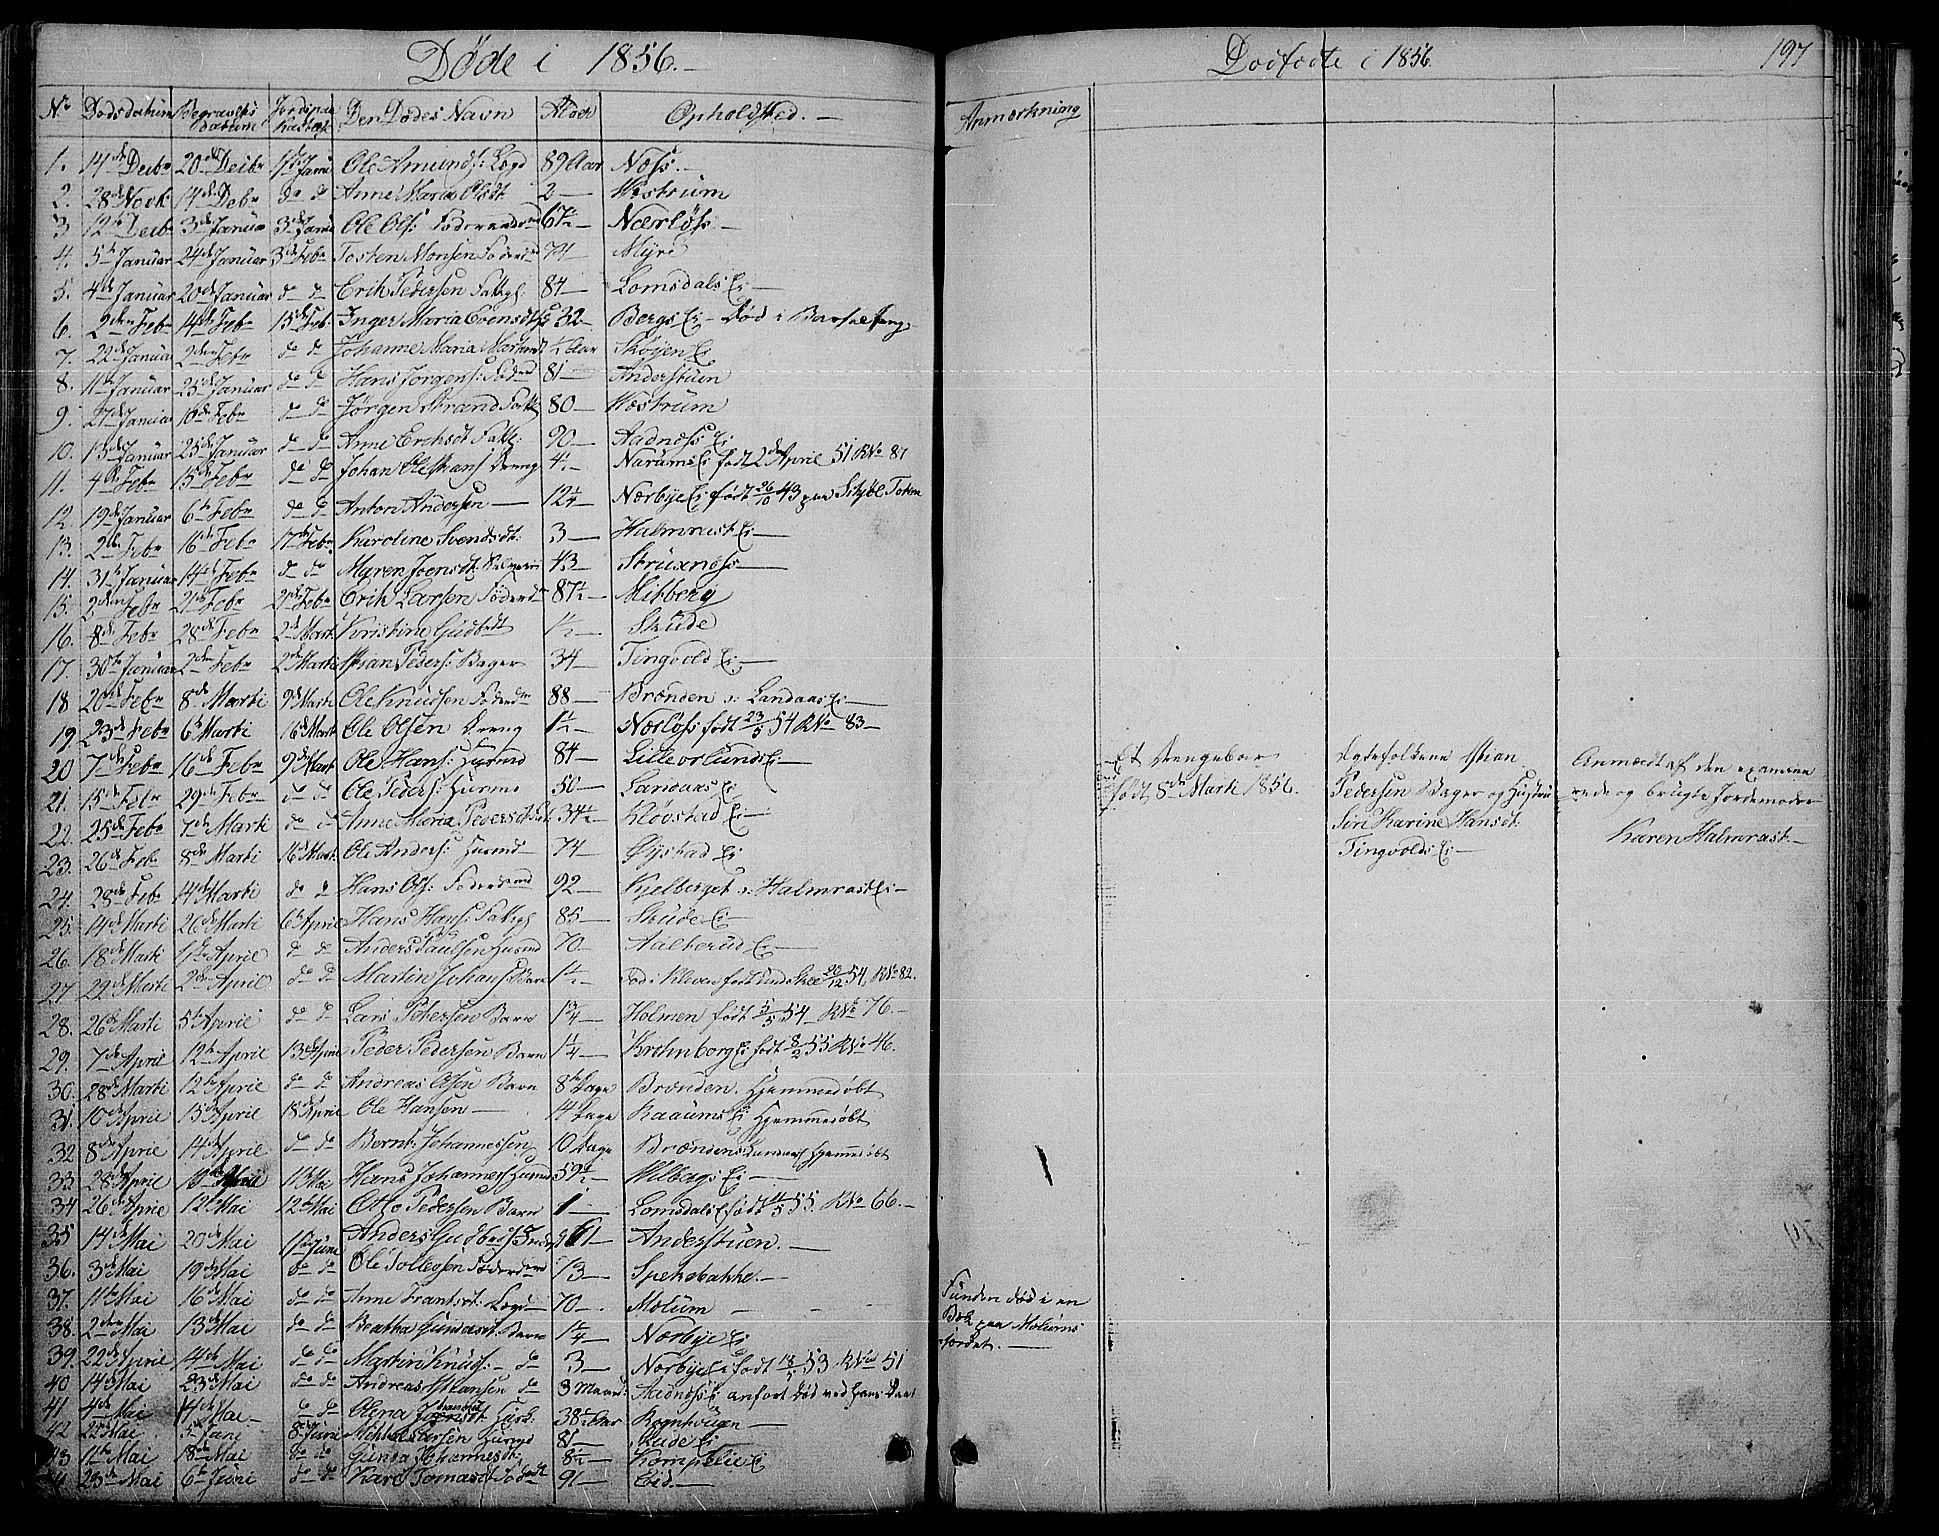 SAH, Søndre Land prestekontor, L/L0001: Klokkerbok nr. 1, 1849-1883, s. 197